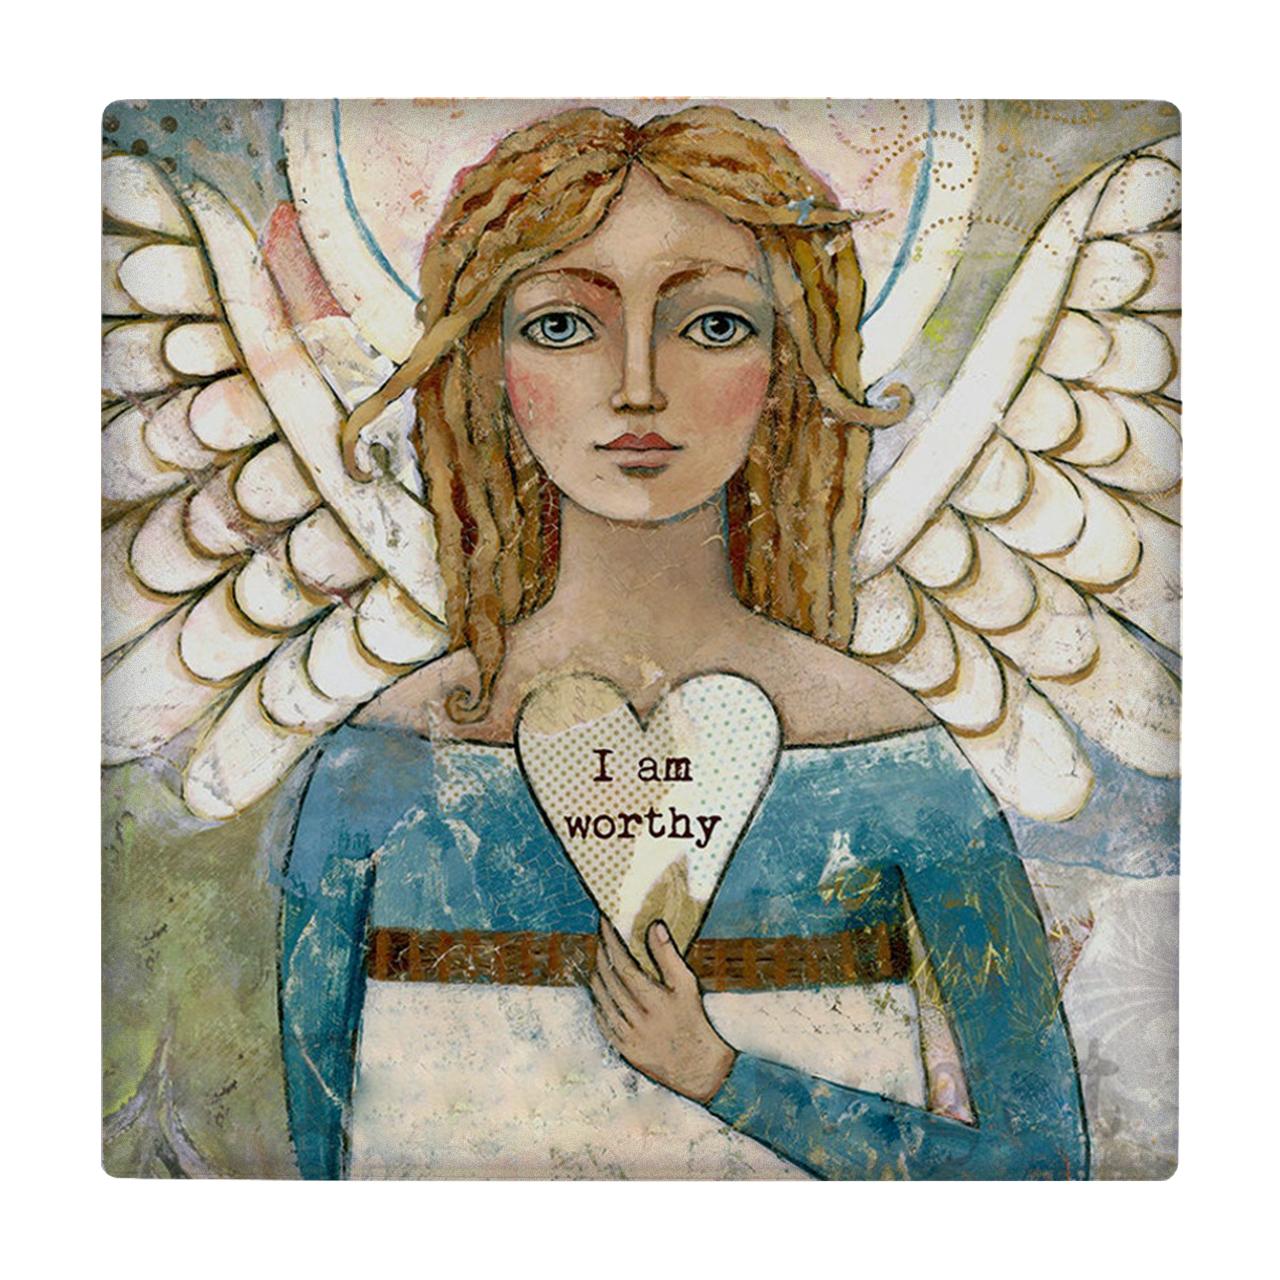 کاشی طرح فرشته کد wk191